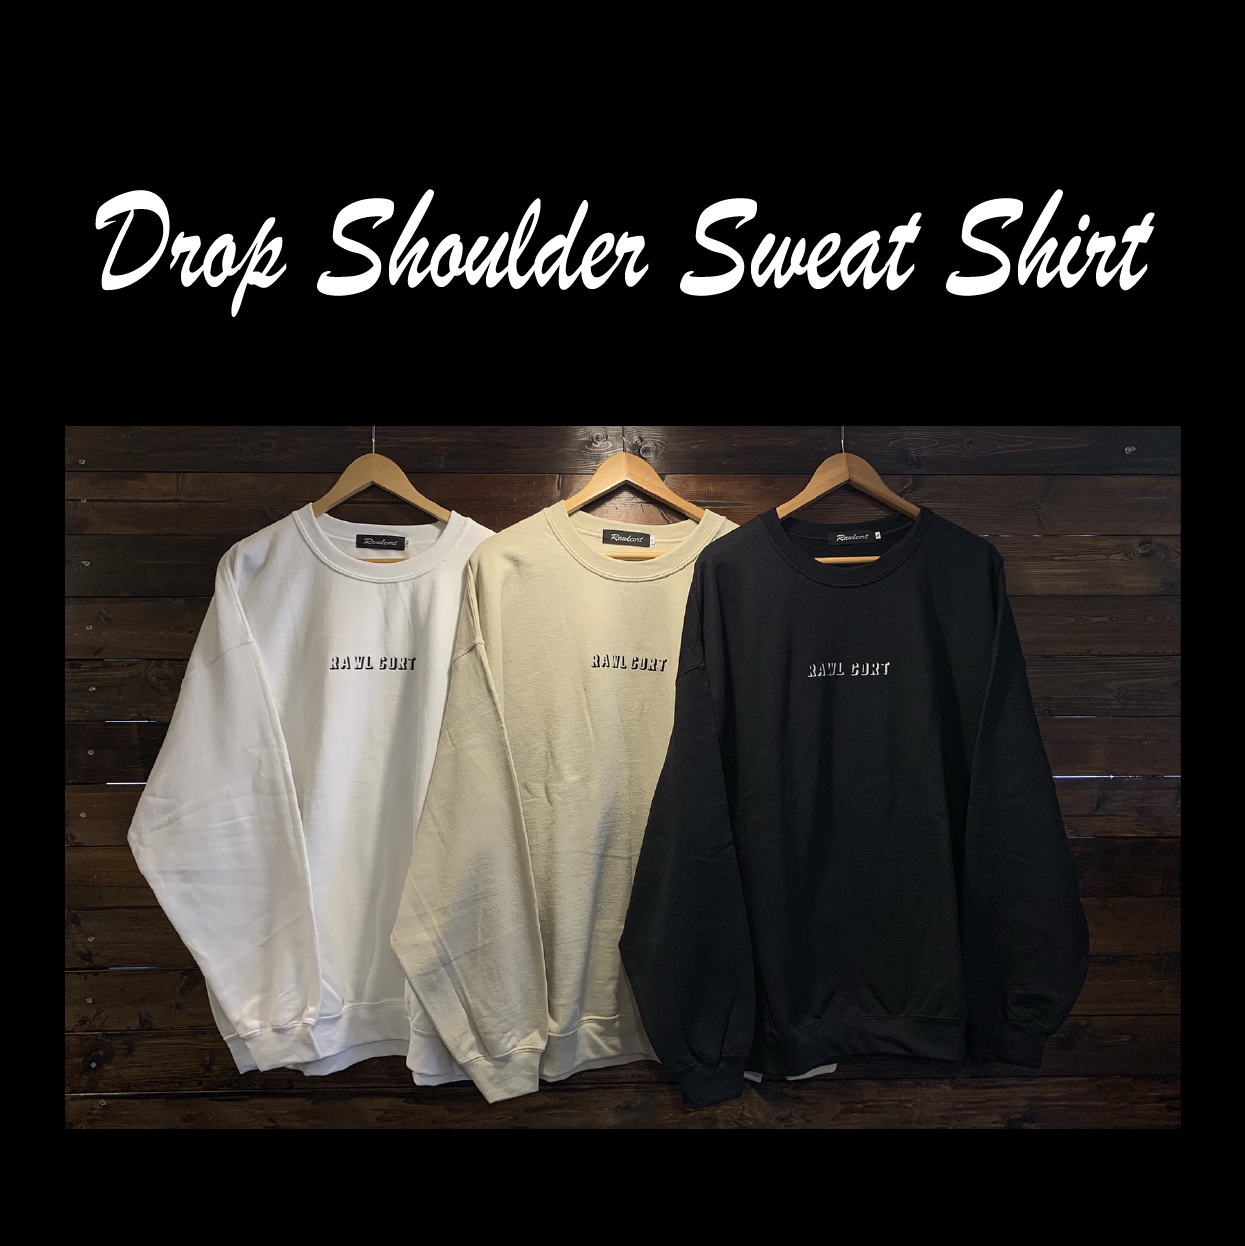 Drop Shoulder Sweat Shirt